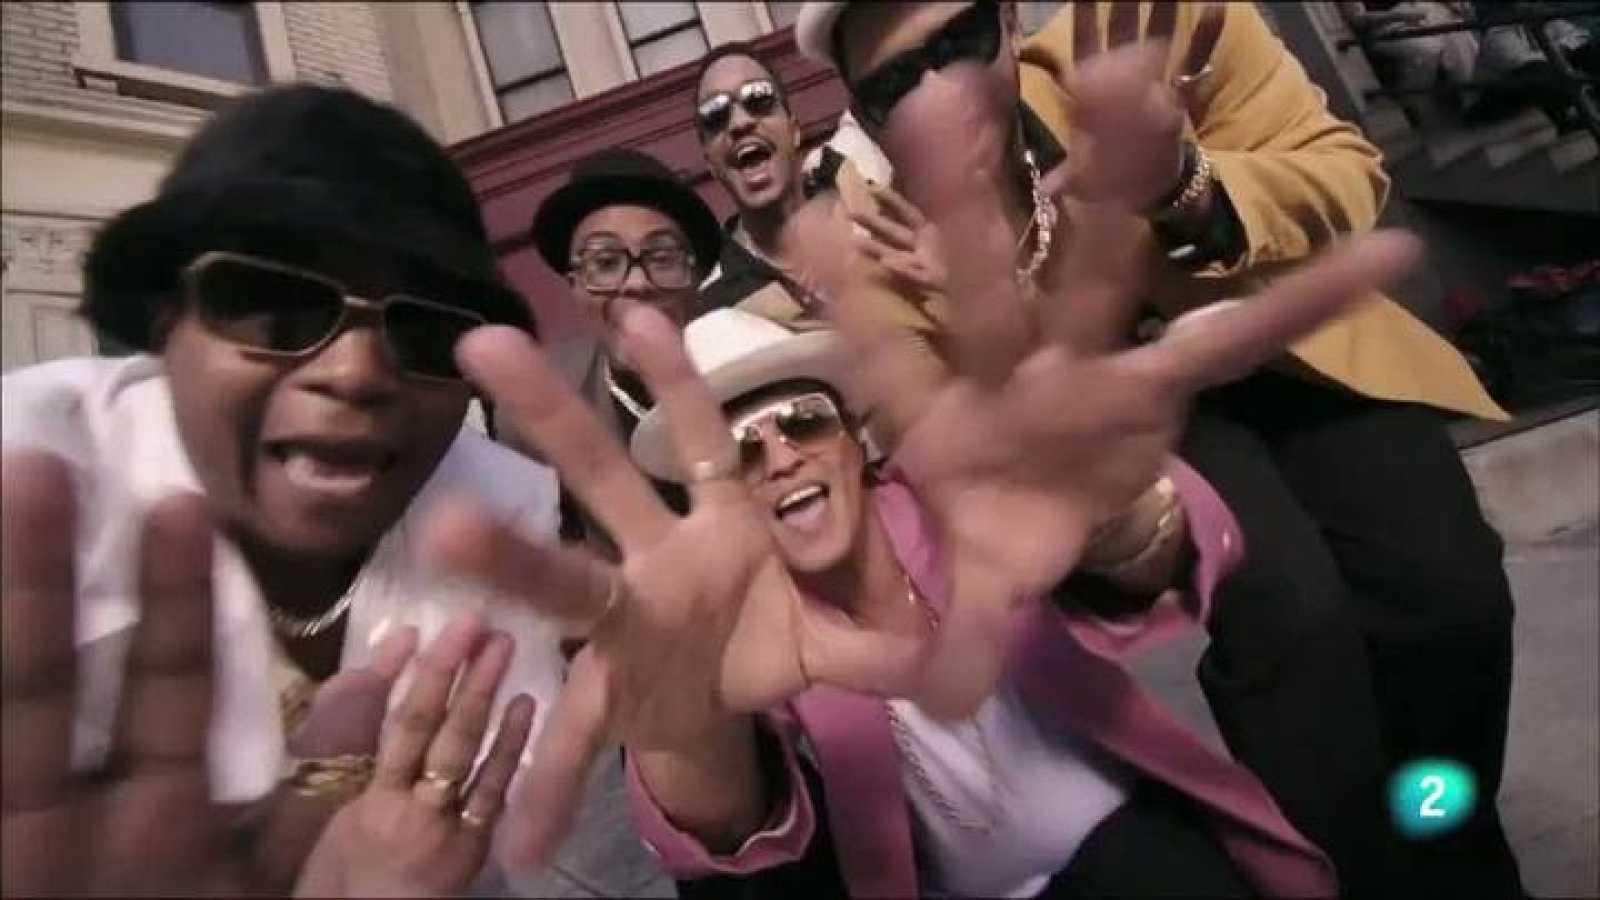 Vídeo viral: 'Uptown Funk', de Mark Ronson i Bruno Mars